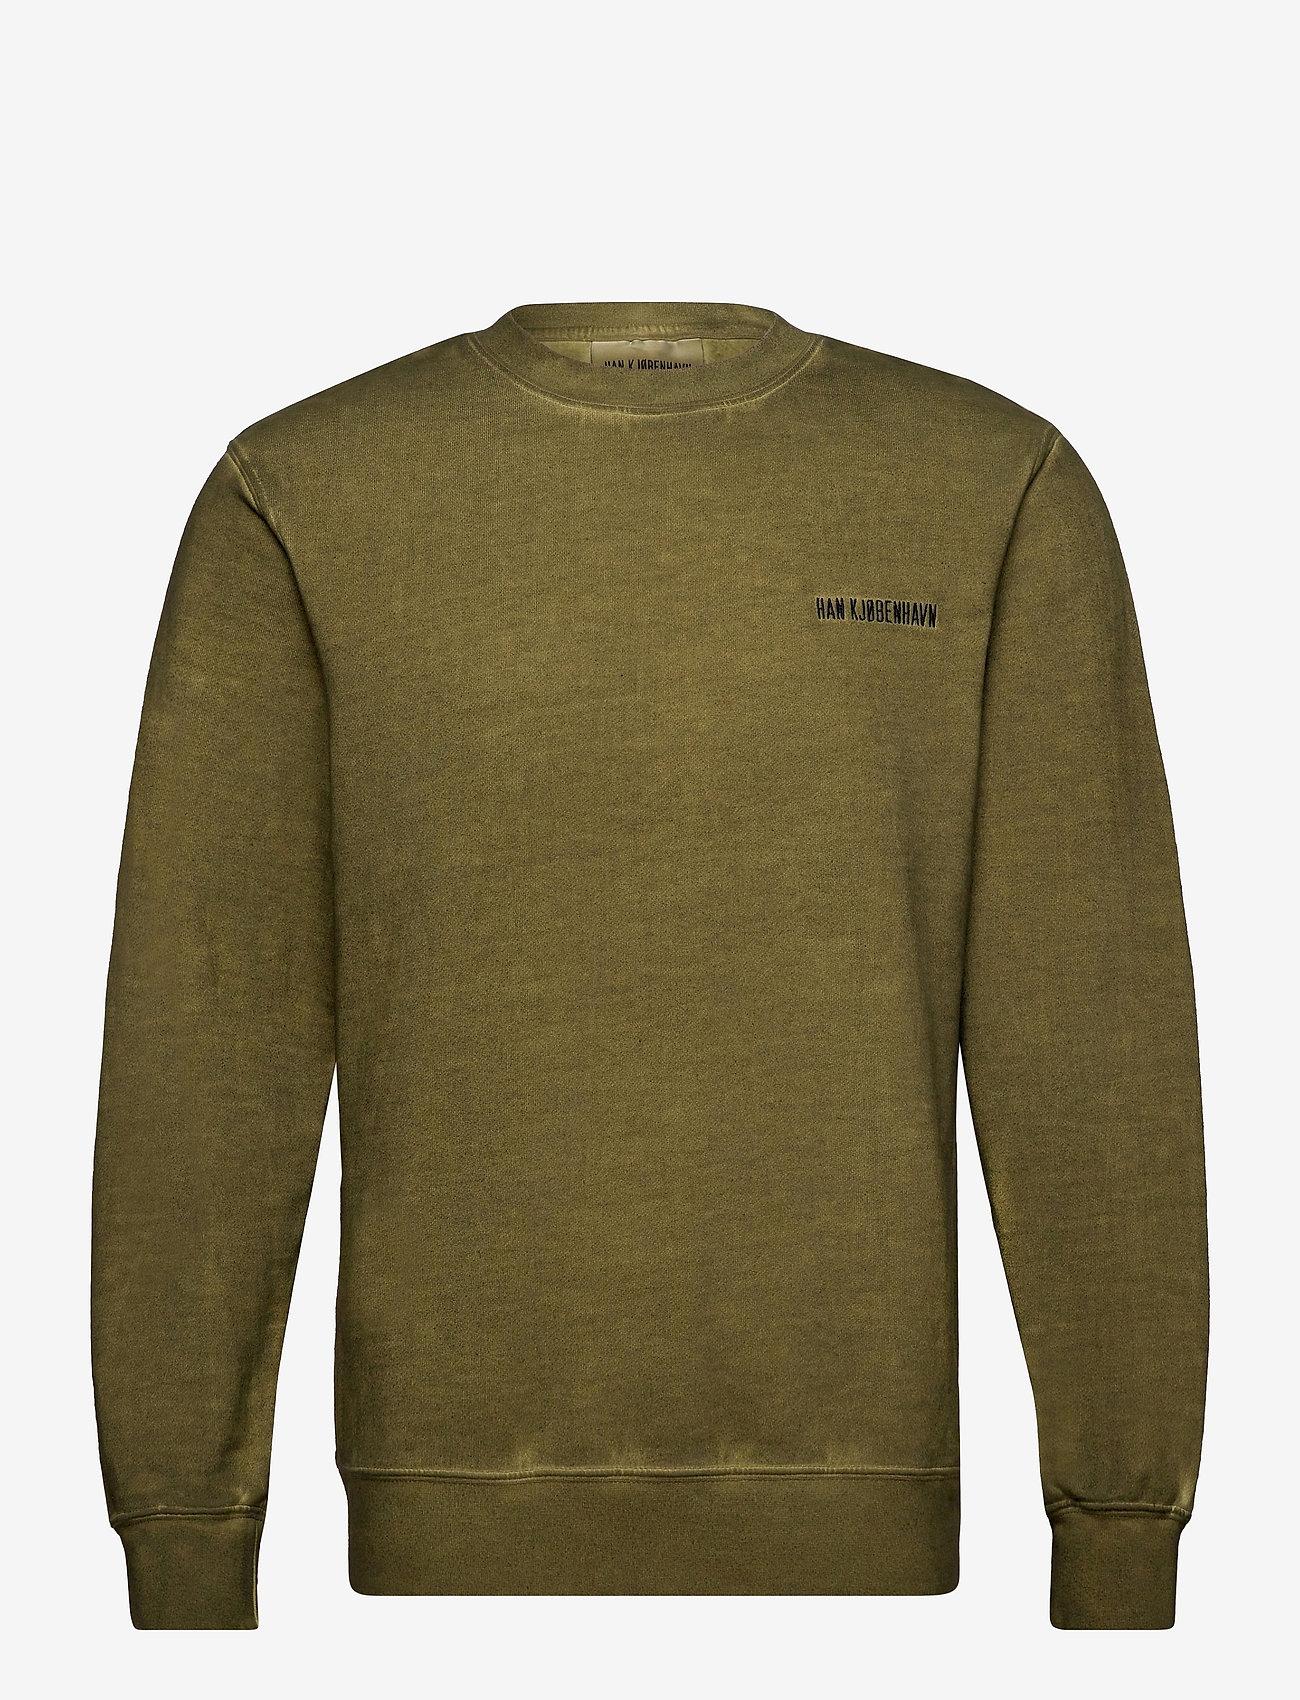 HAN Kjøbenhavn - Casual Crew - basic sweatshirts - green crush - 1